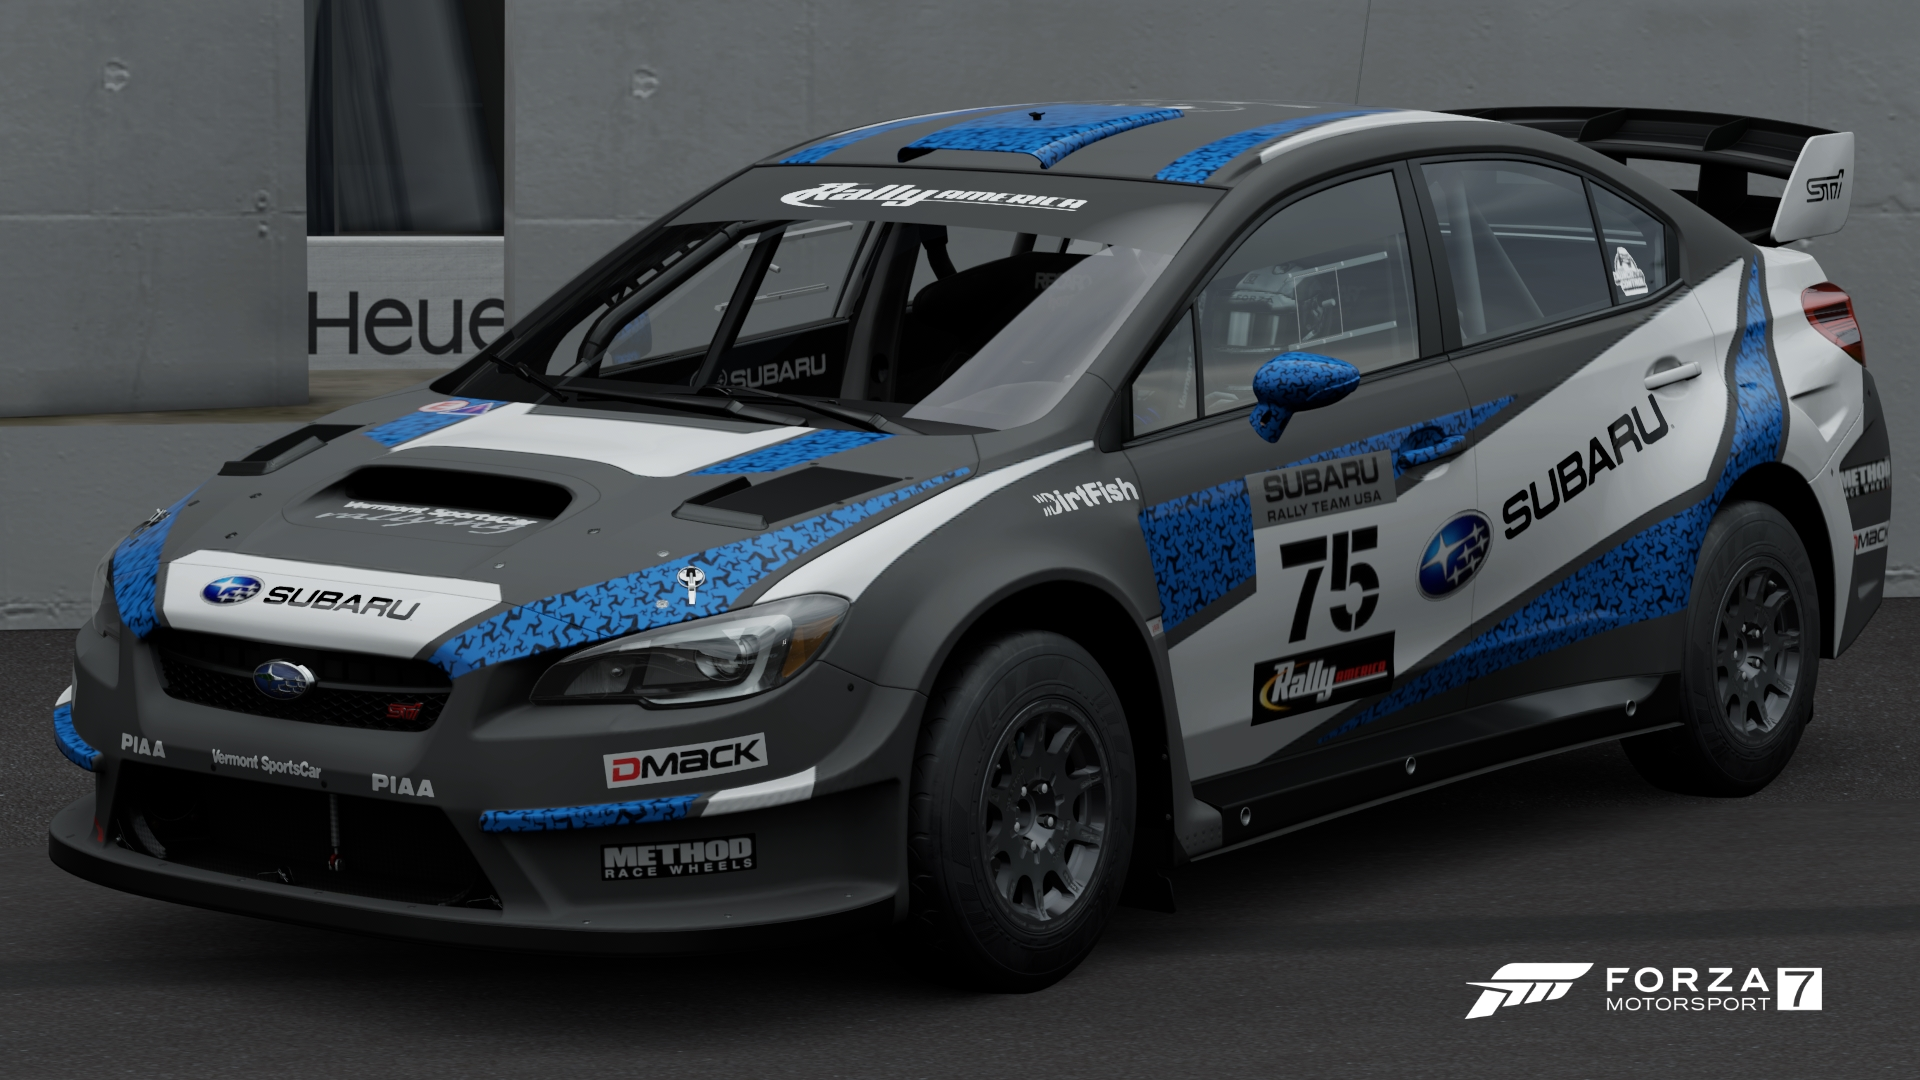 Subaru Rally Car >> Subaru Wrx Sti Vt15r Rally Car Forza Motorsport Wiki Fandom